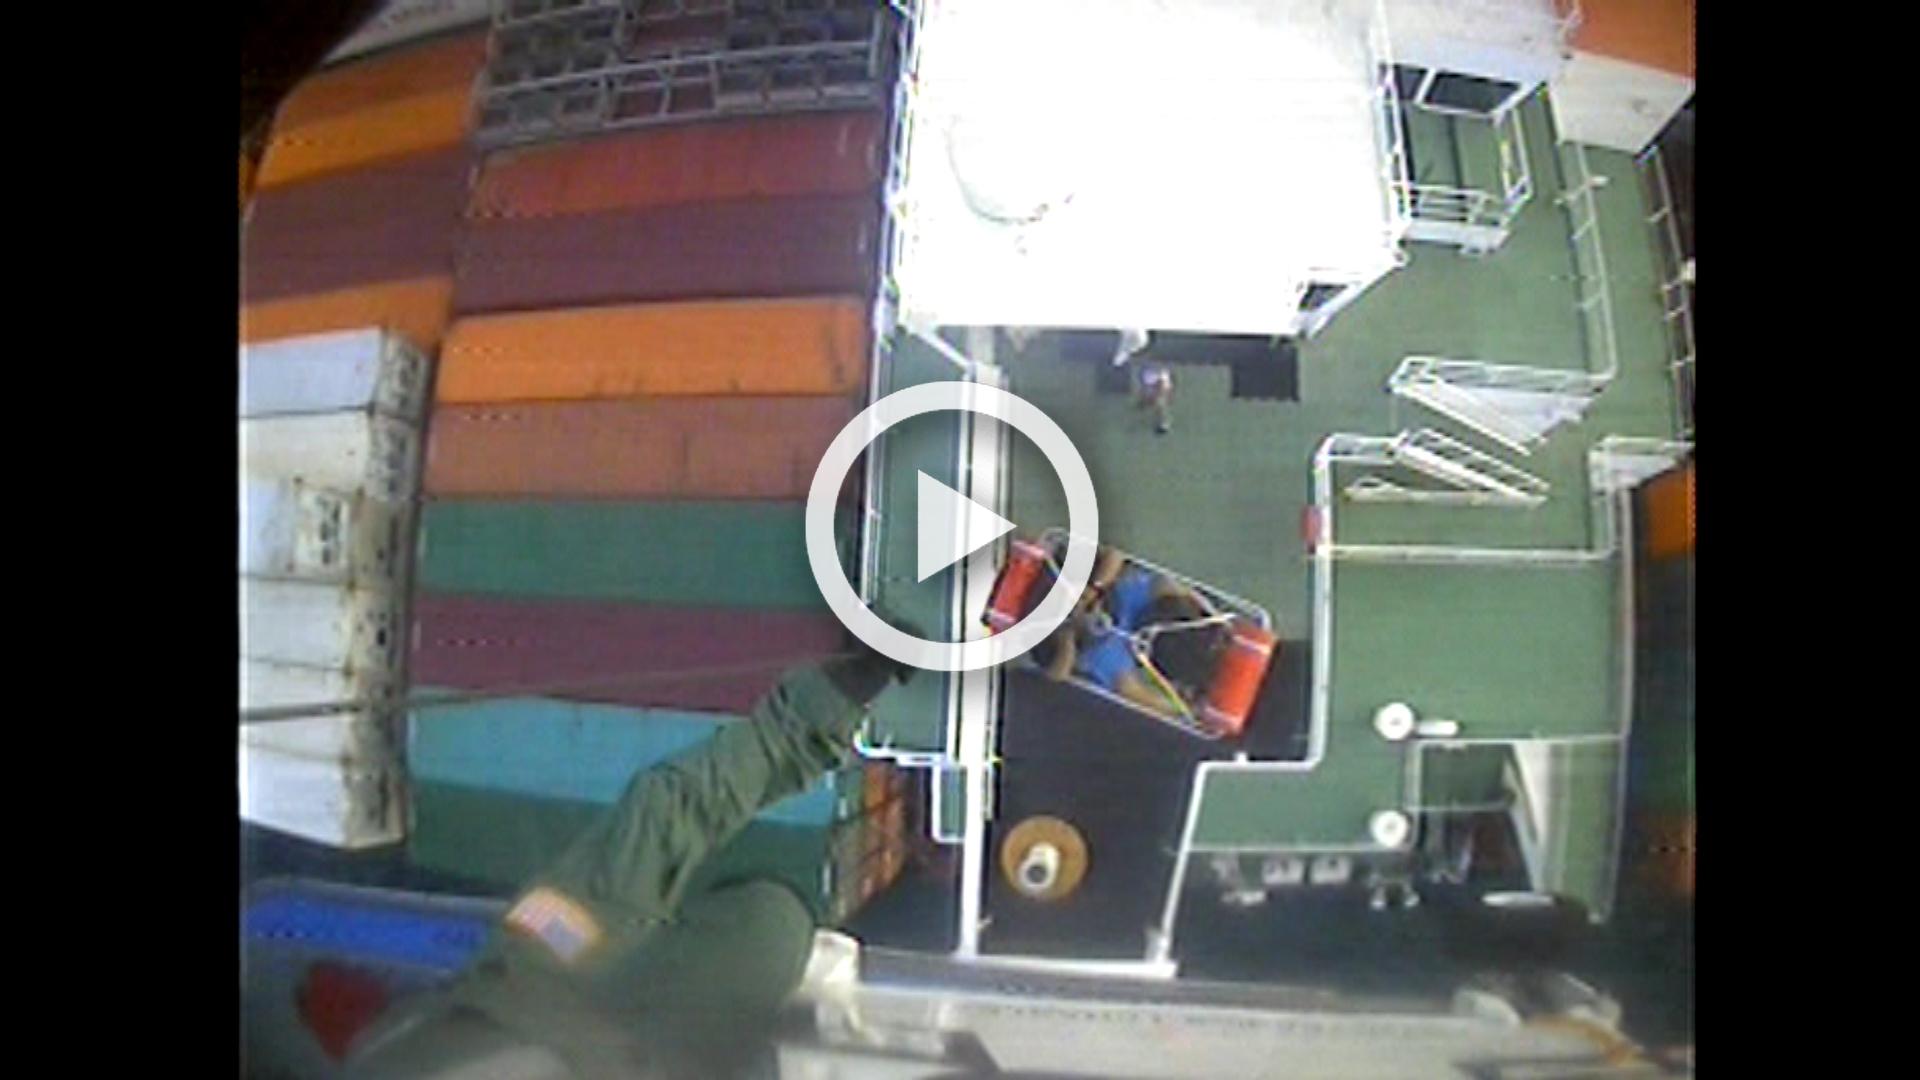 VIDEO RELEASE: Coast Guard medevacs man 24 miles east of Tybee Island